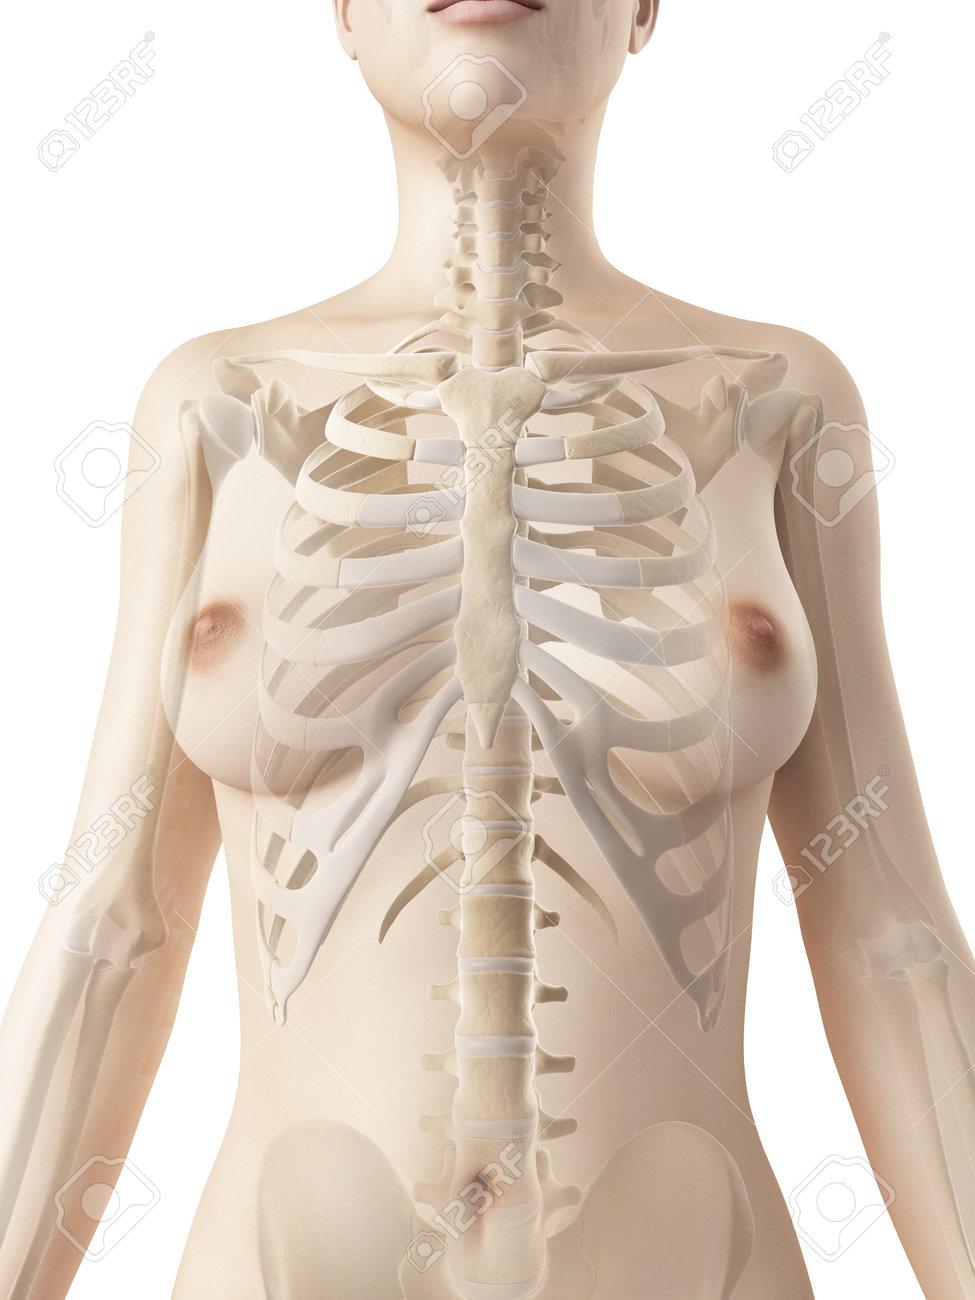 rendered illustration of the female thorax bones Stock Photo - 23222177